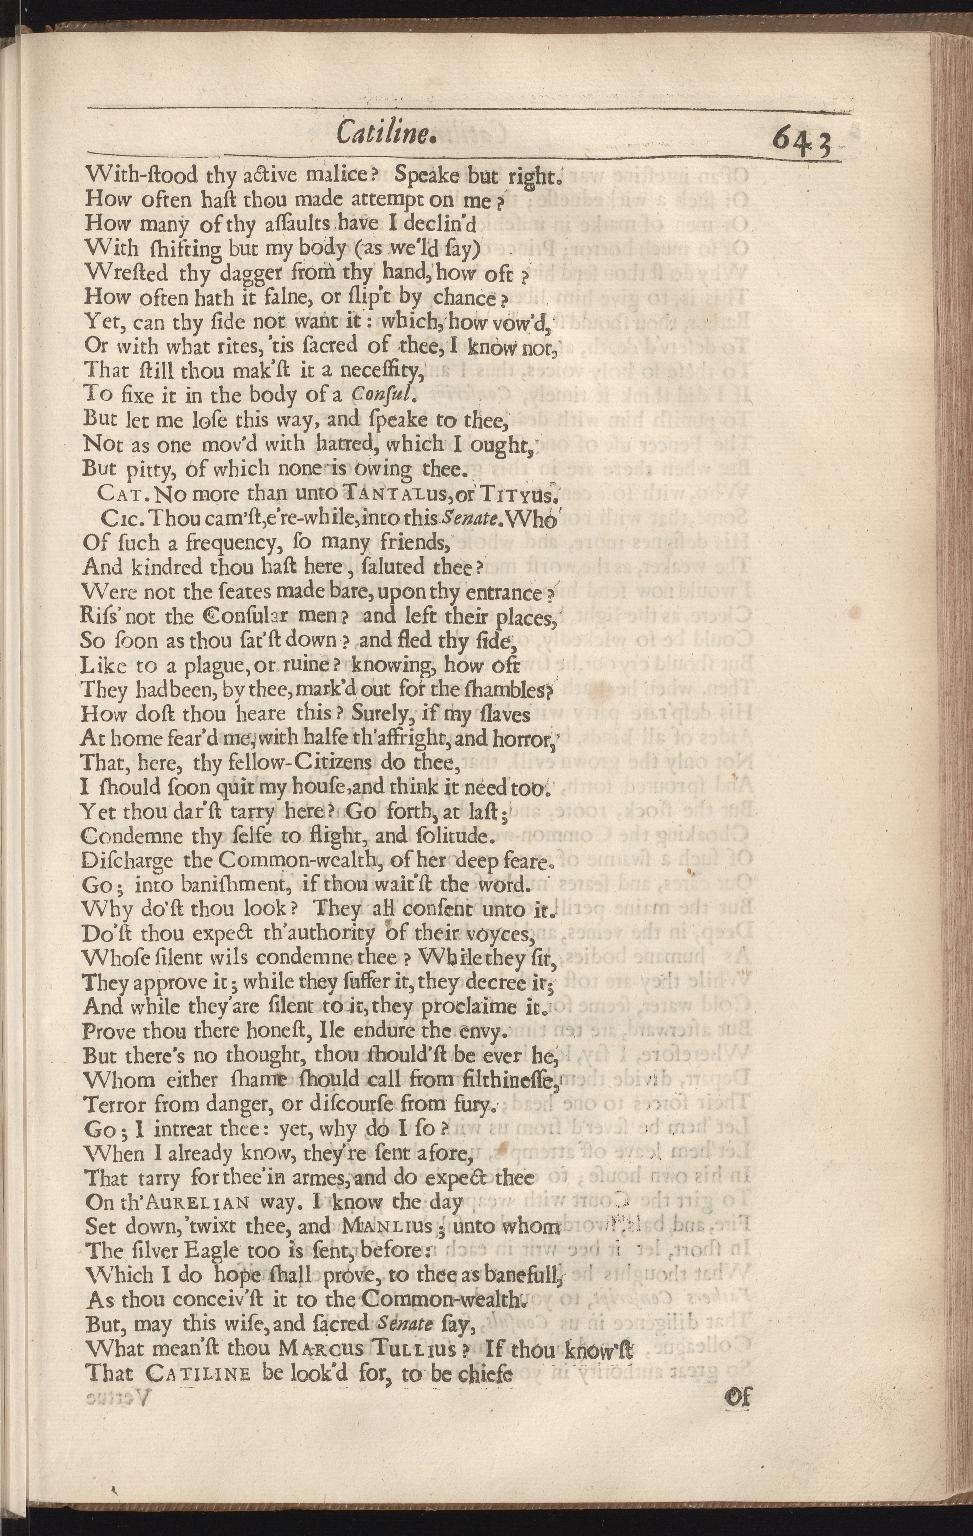 The workes of Benjamin Jonson, p.643